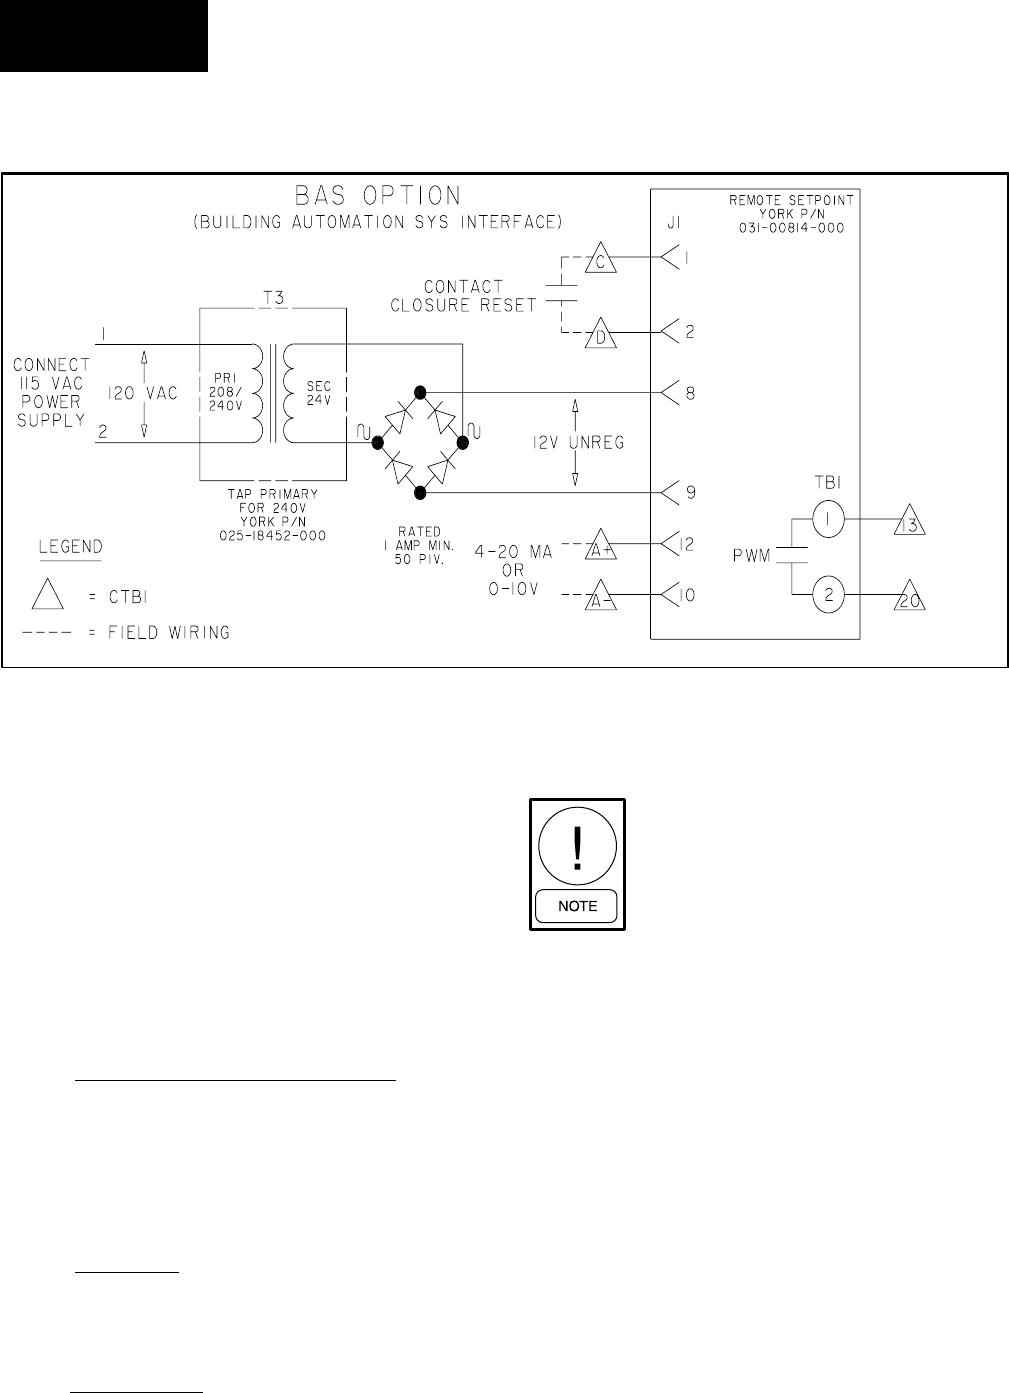 wiring 240v bas york ycal0014sc users manual form 150 62 nm1  700   millennium air  york ycal0014sc users manual form 150